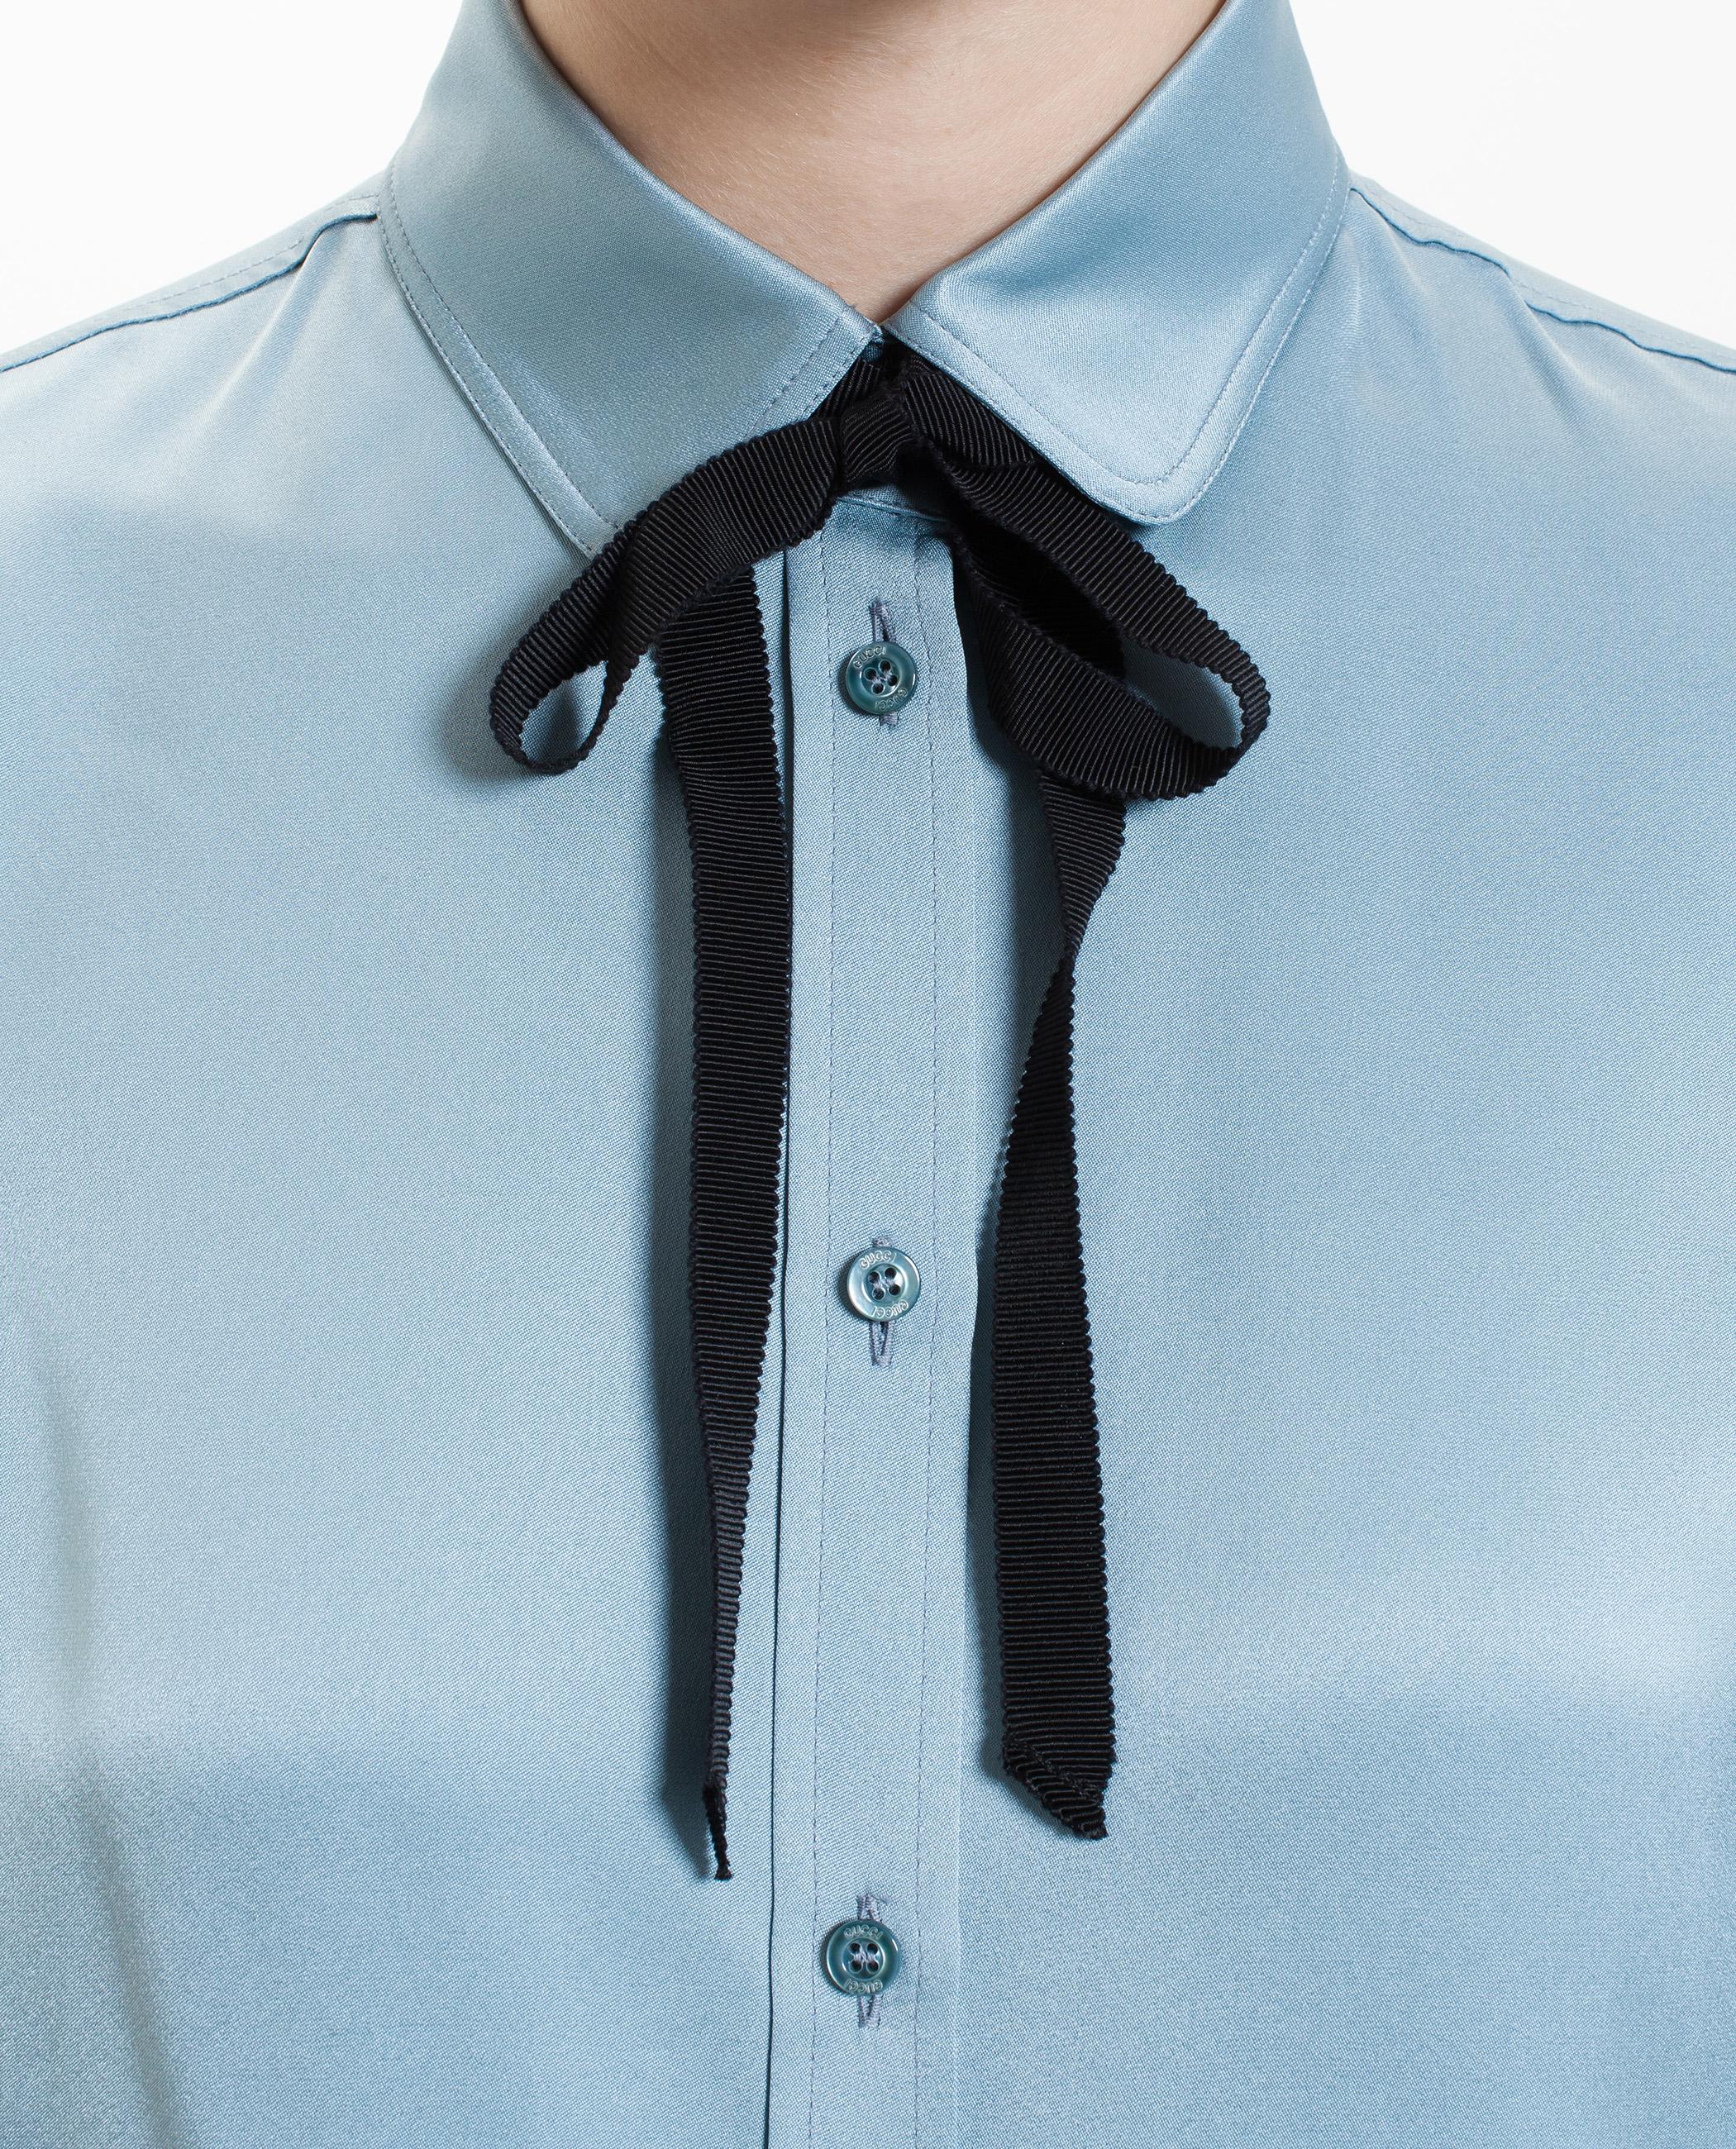 308d1636ad78d3 Lyst - Gucci Silk Shirt With Necktie in Blue